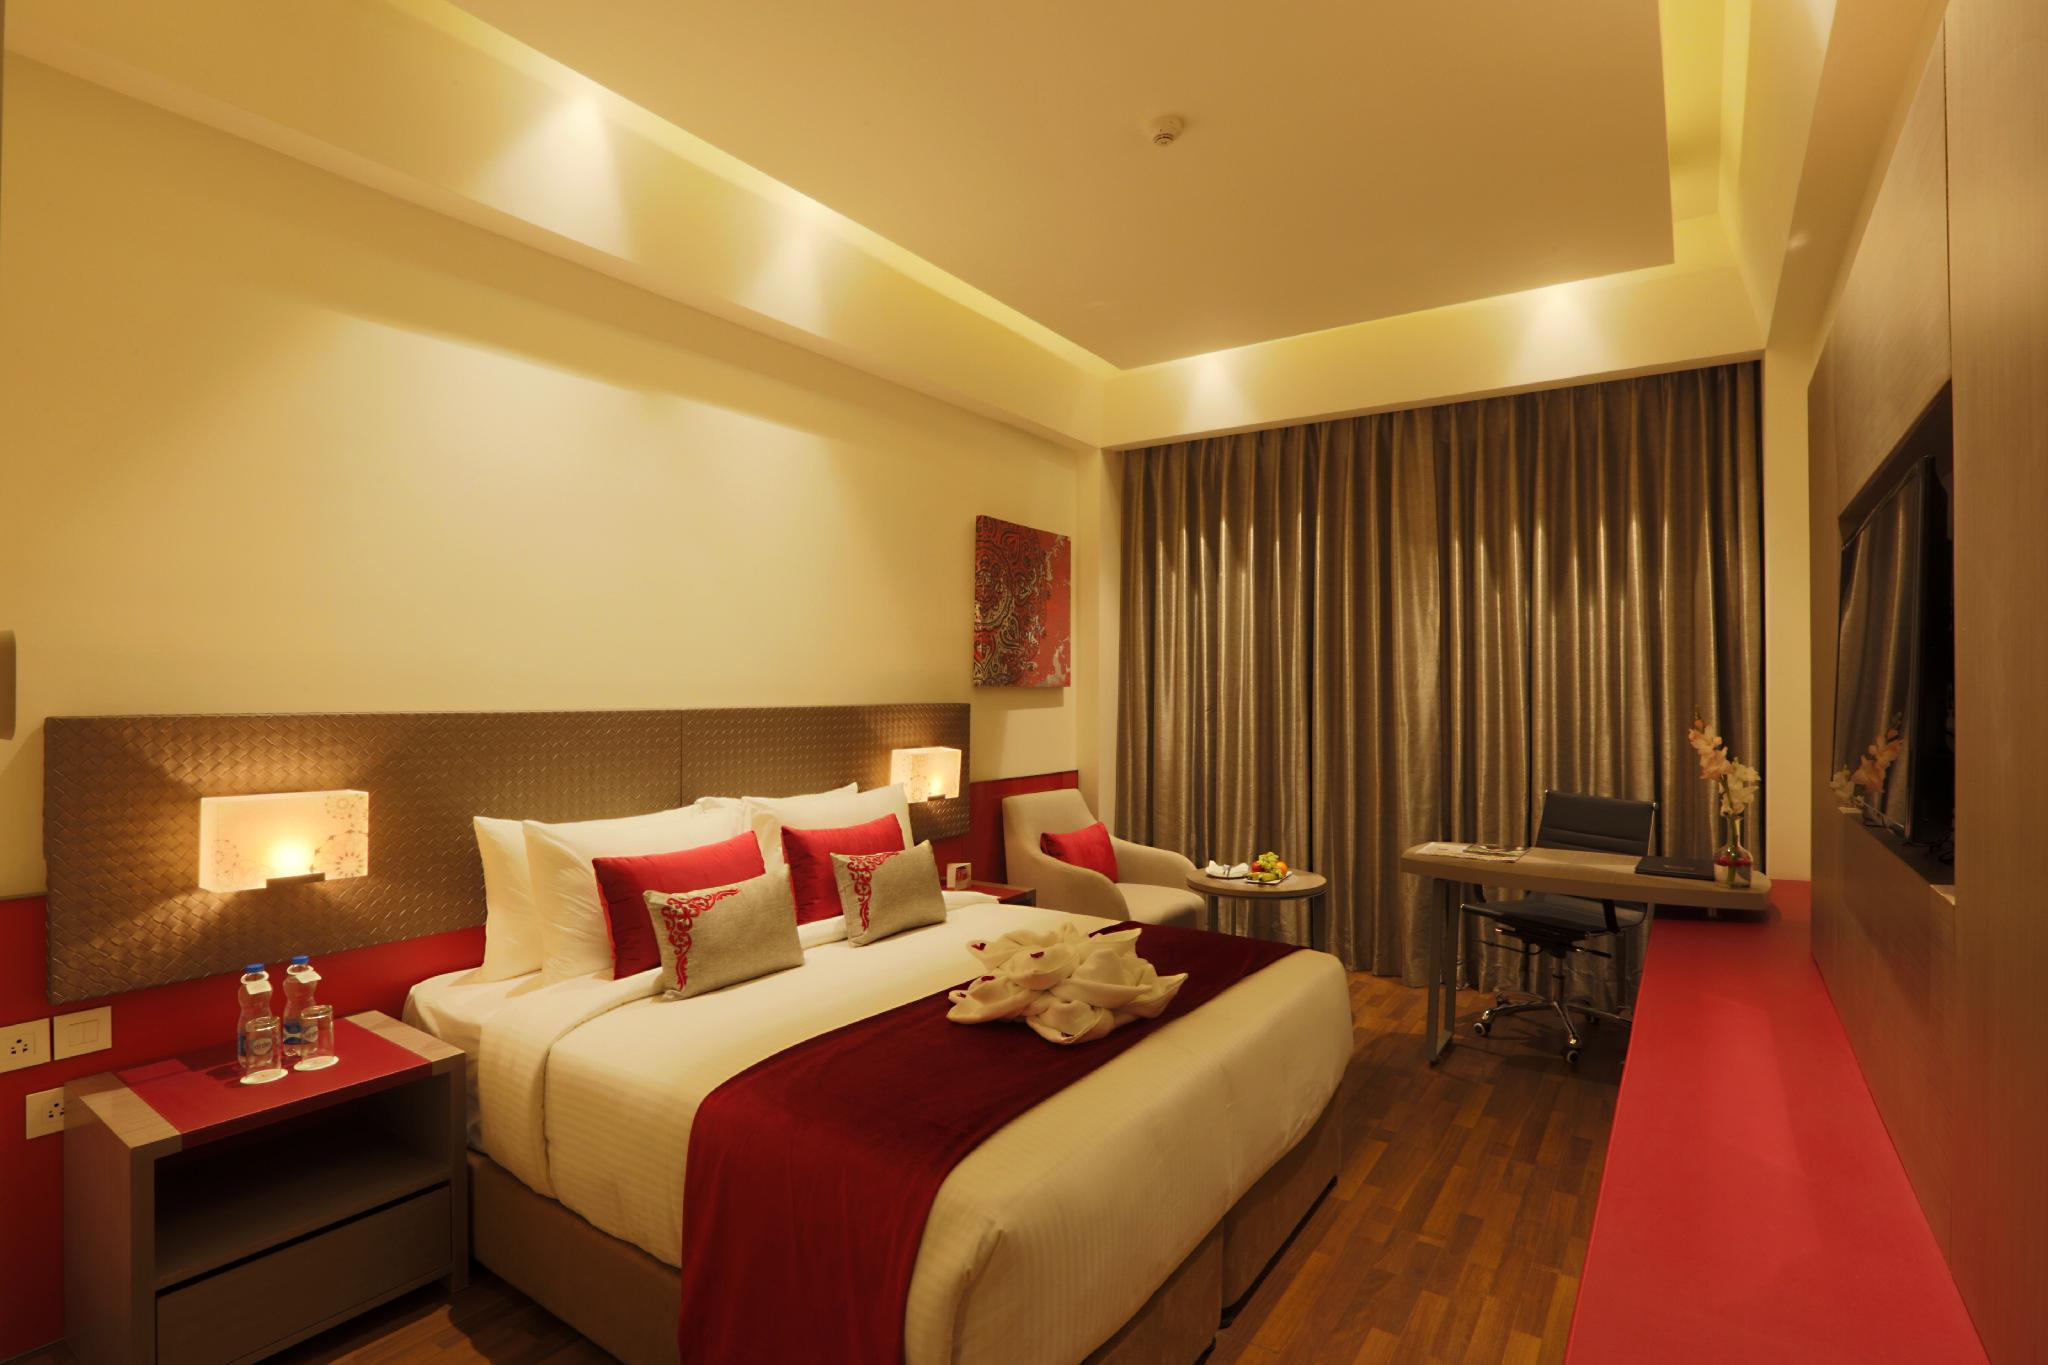 interior design company in lucknow ireland